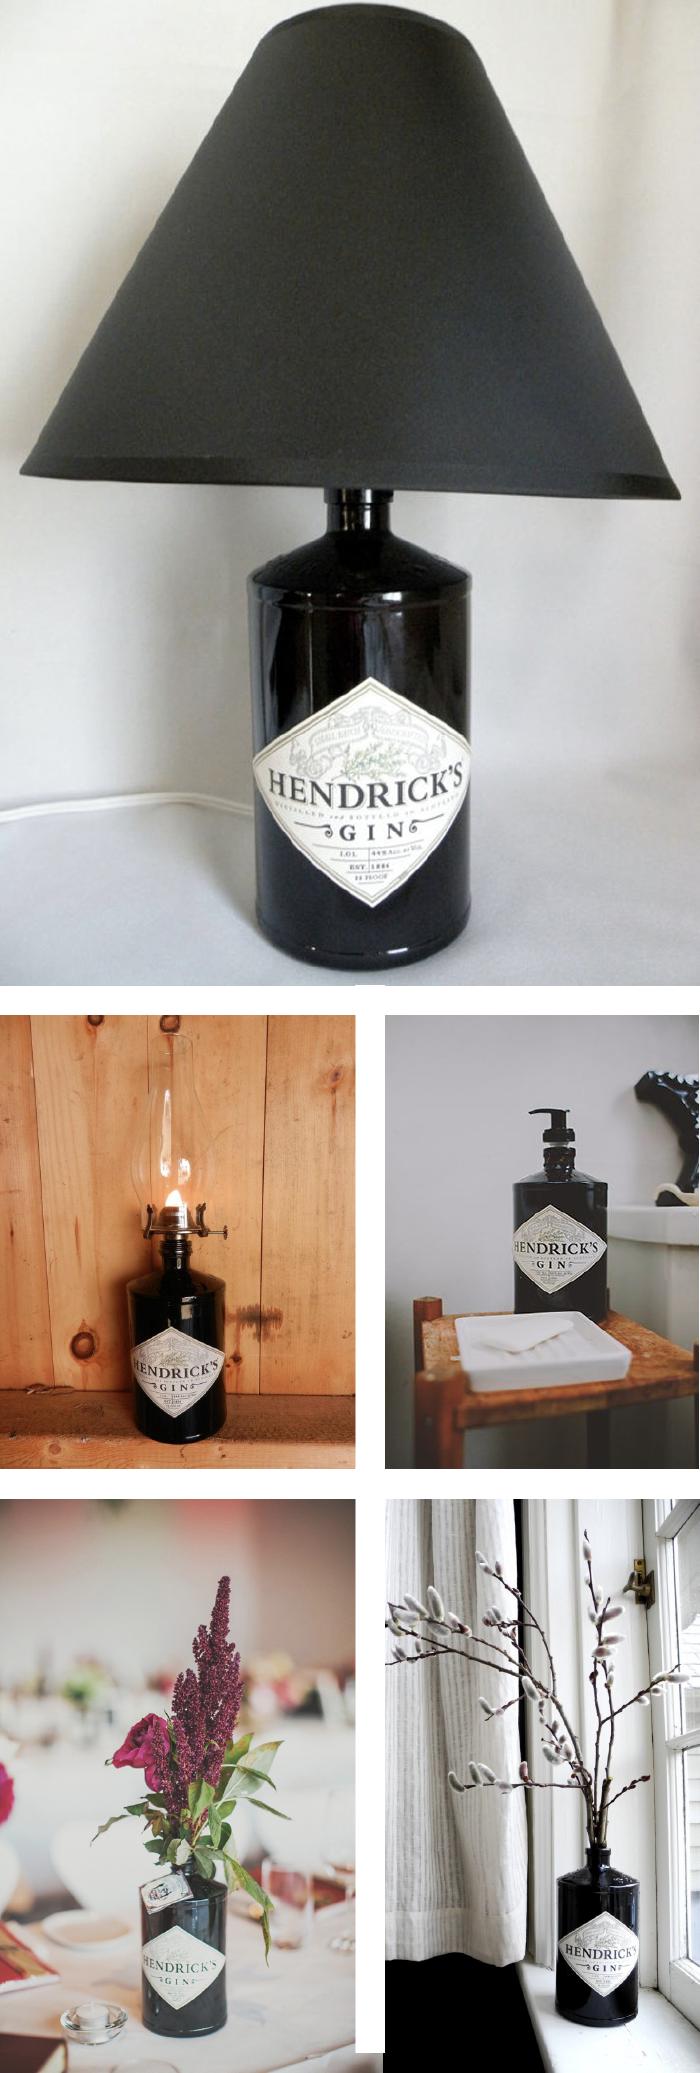 Hendrick's Gin reused